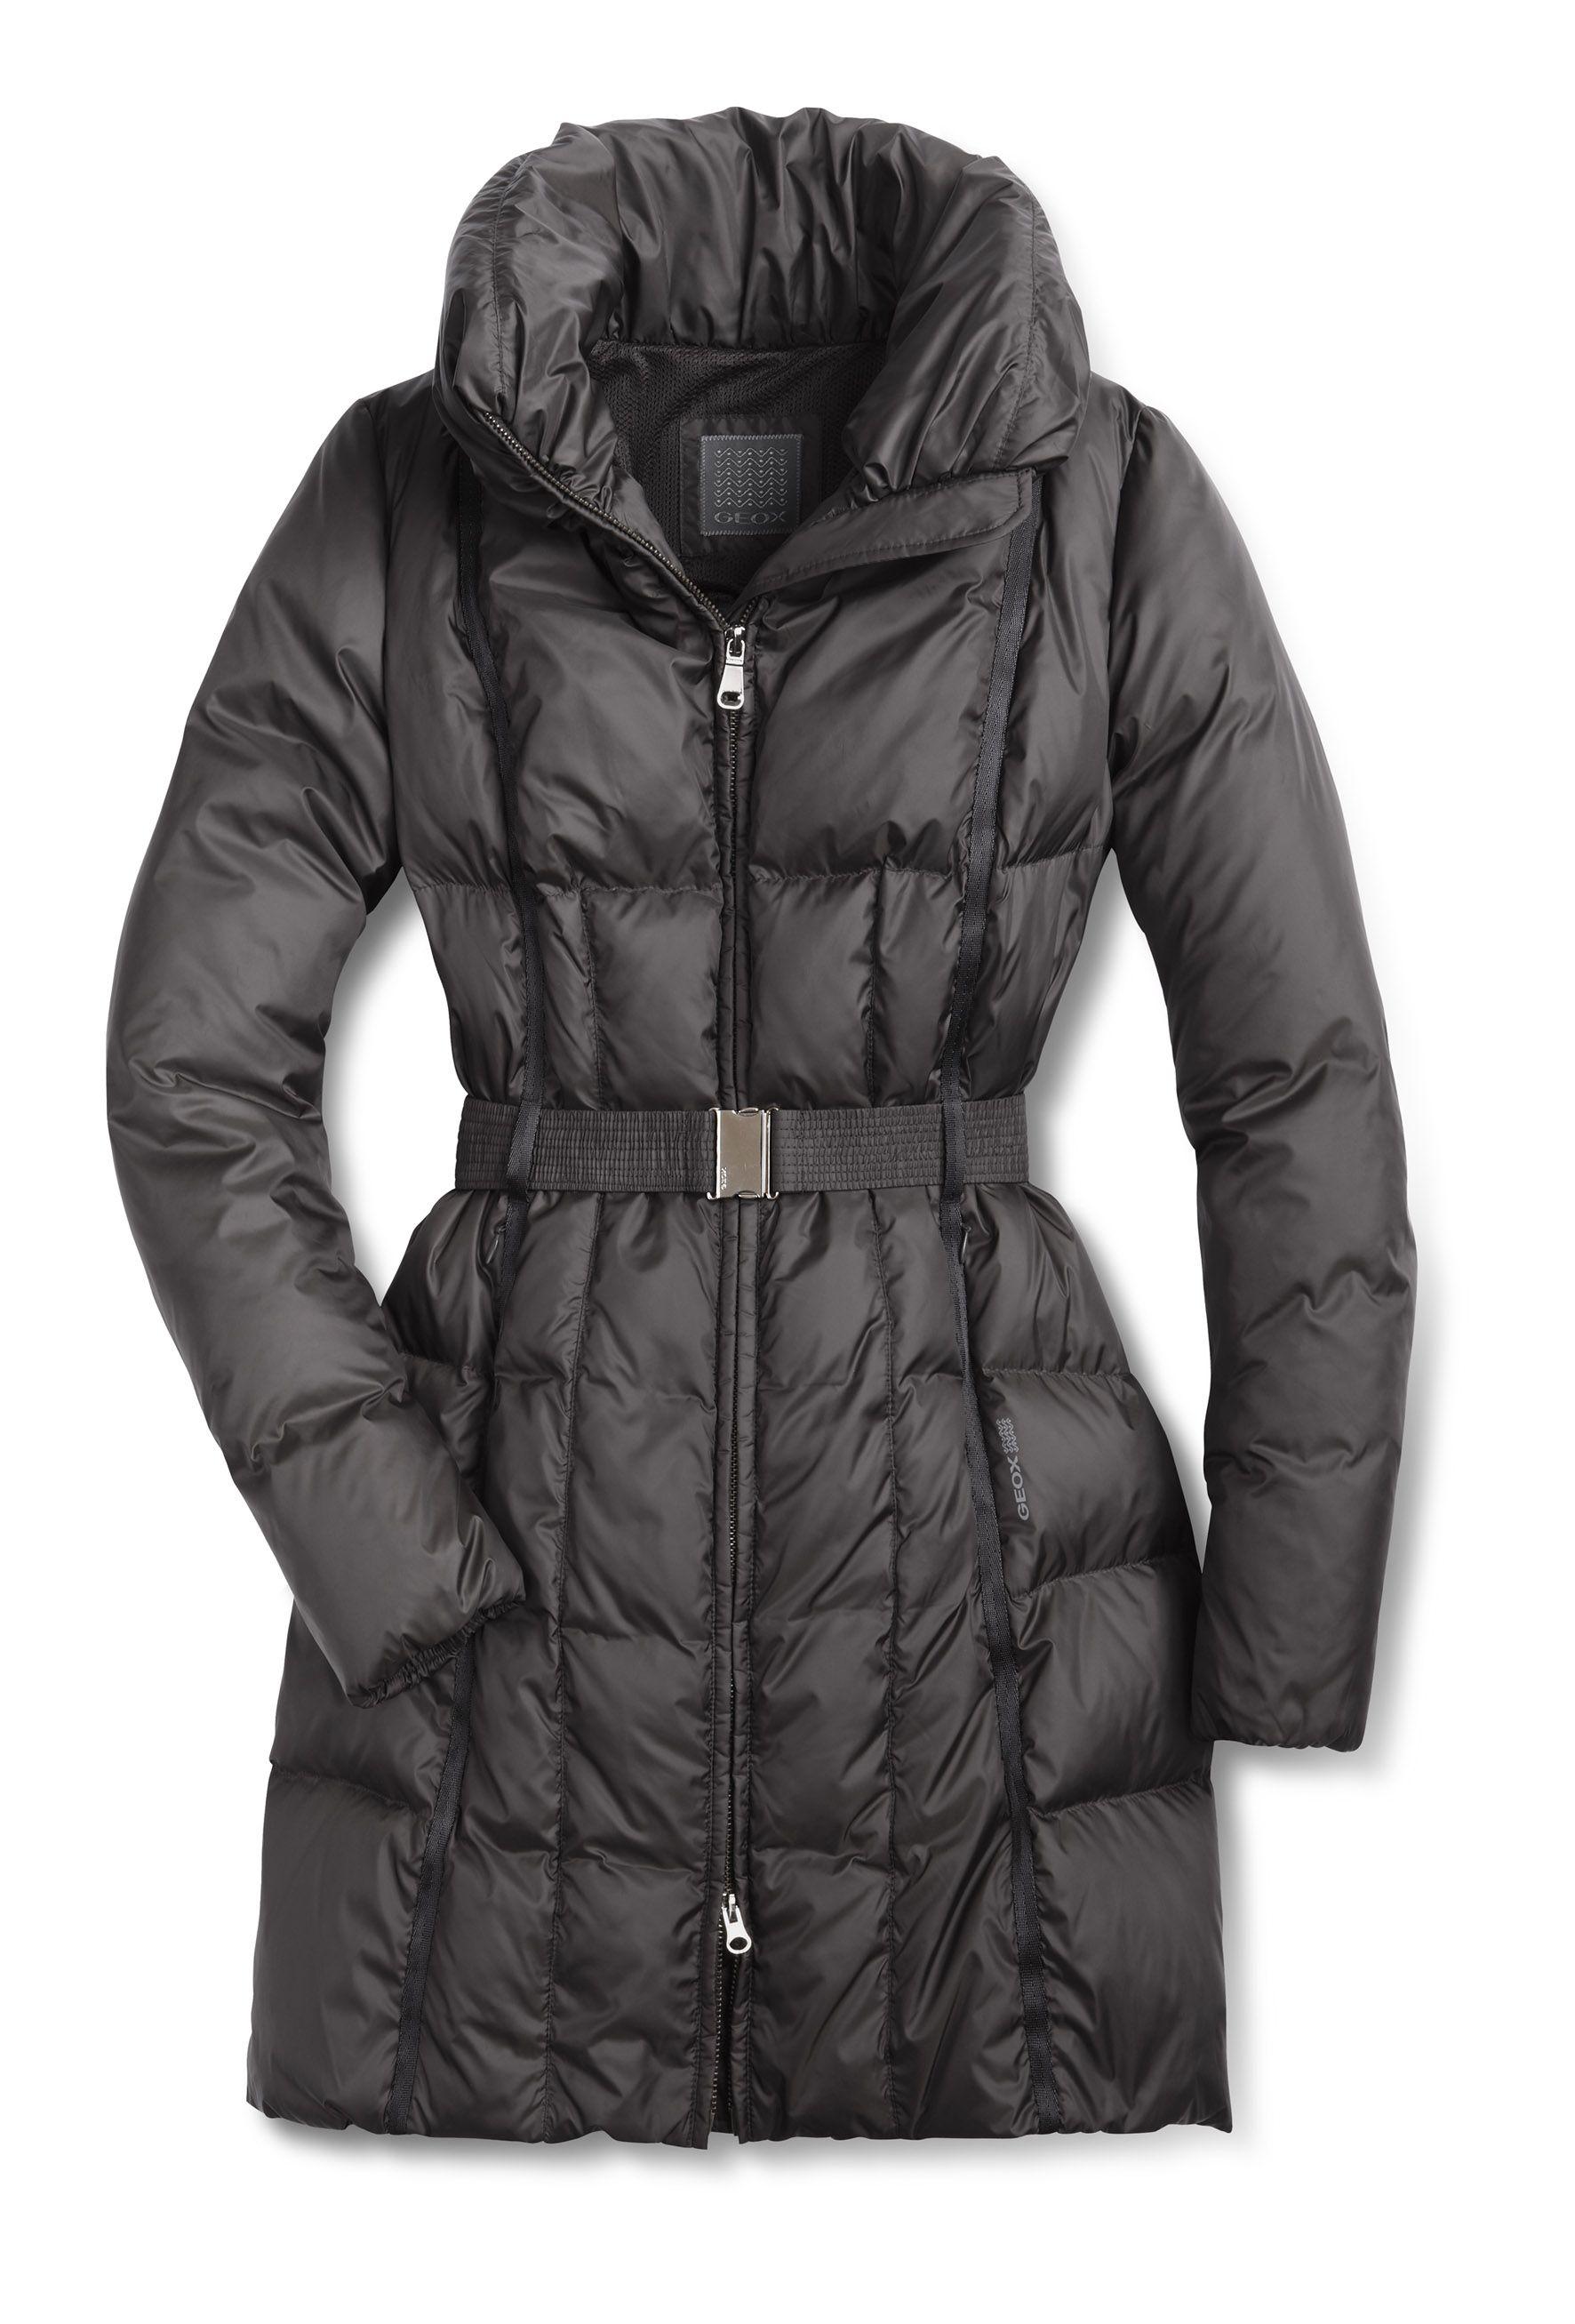 a1c8f366a3 GEOX Woman Long Coat | Fashion | Winter coats women, Jackets for ...